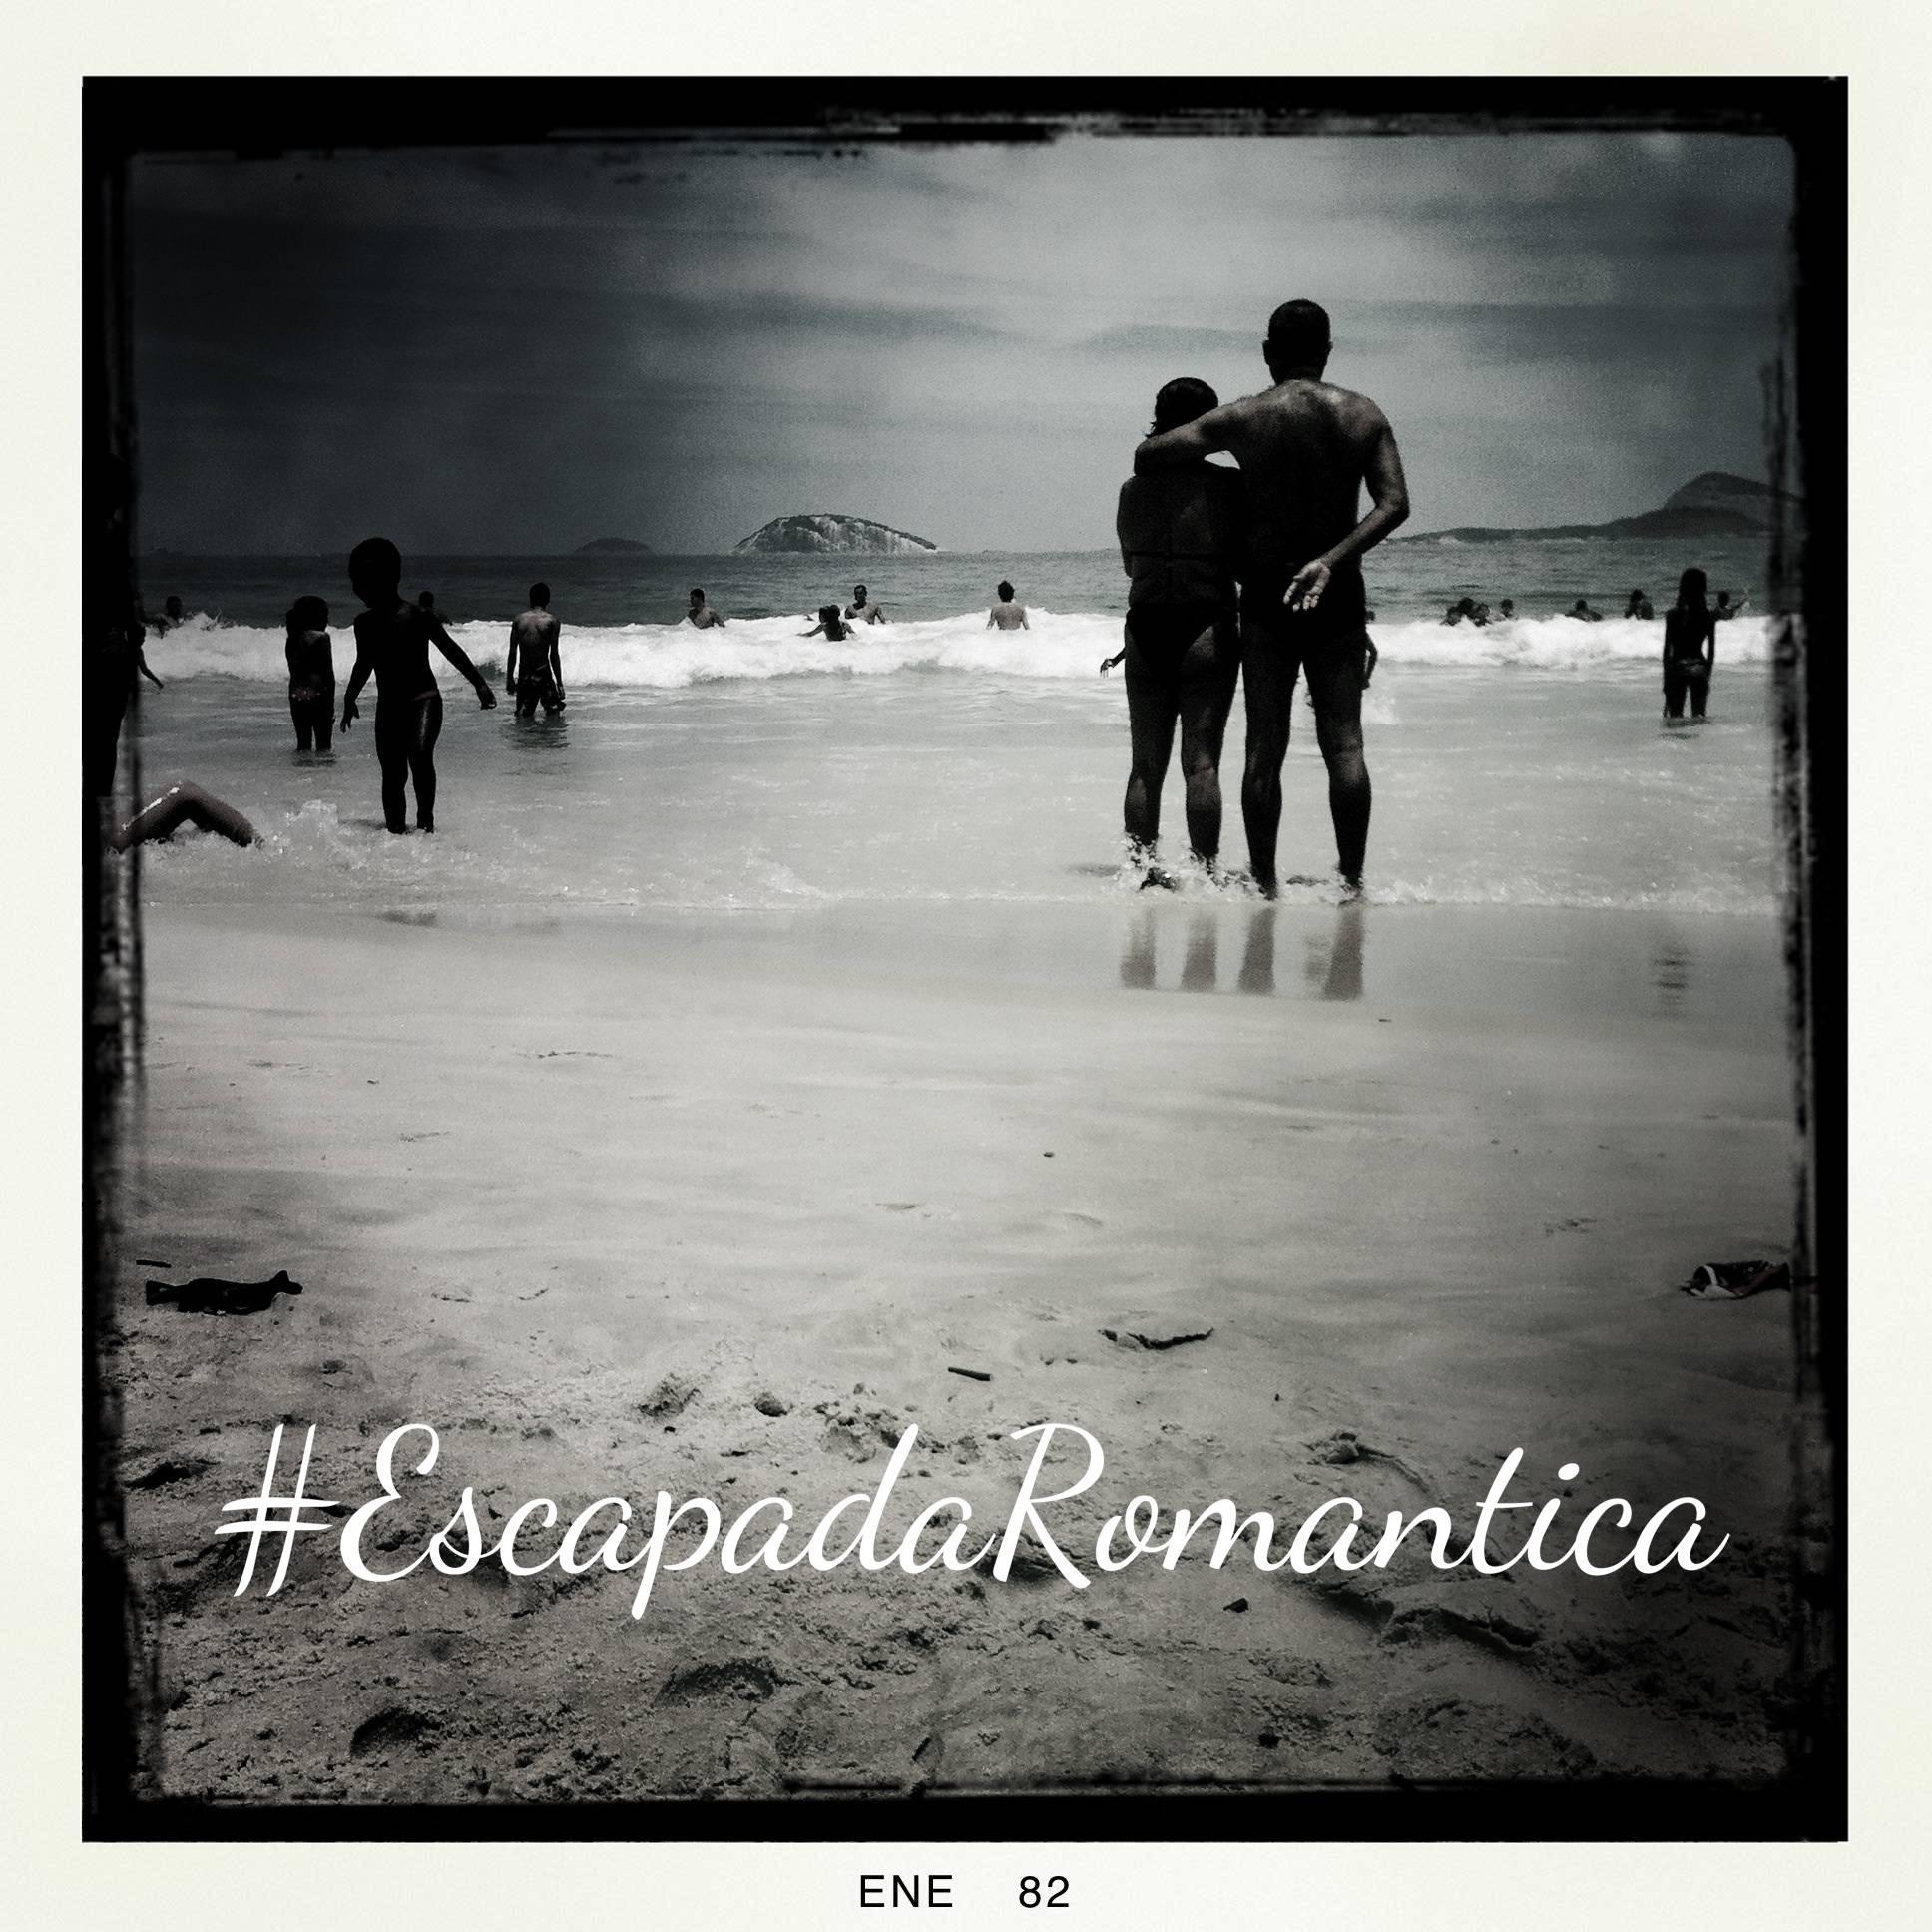 Concurso #escapadaromantica en San Valentin con enfemenino